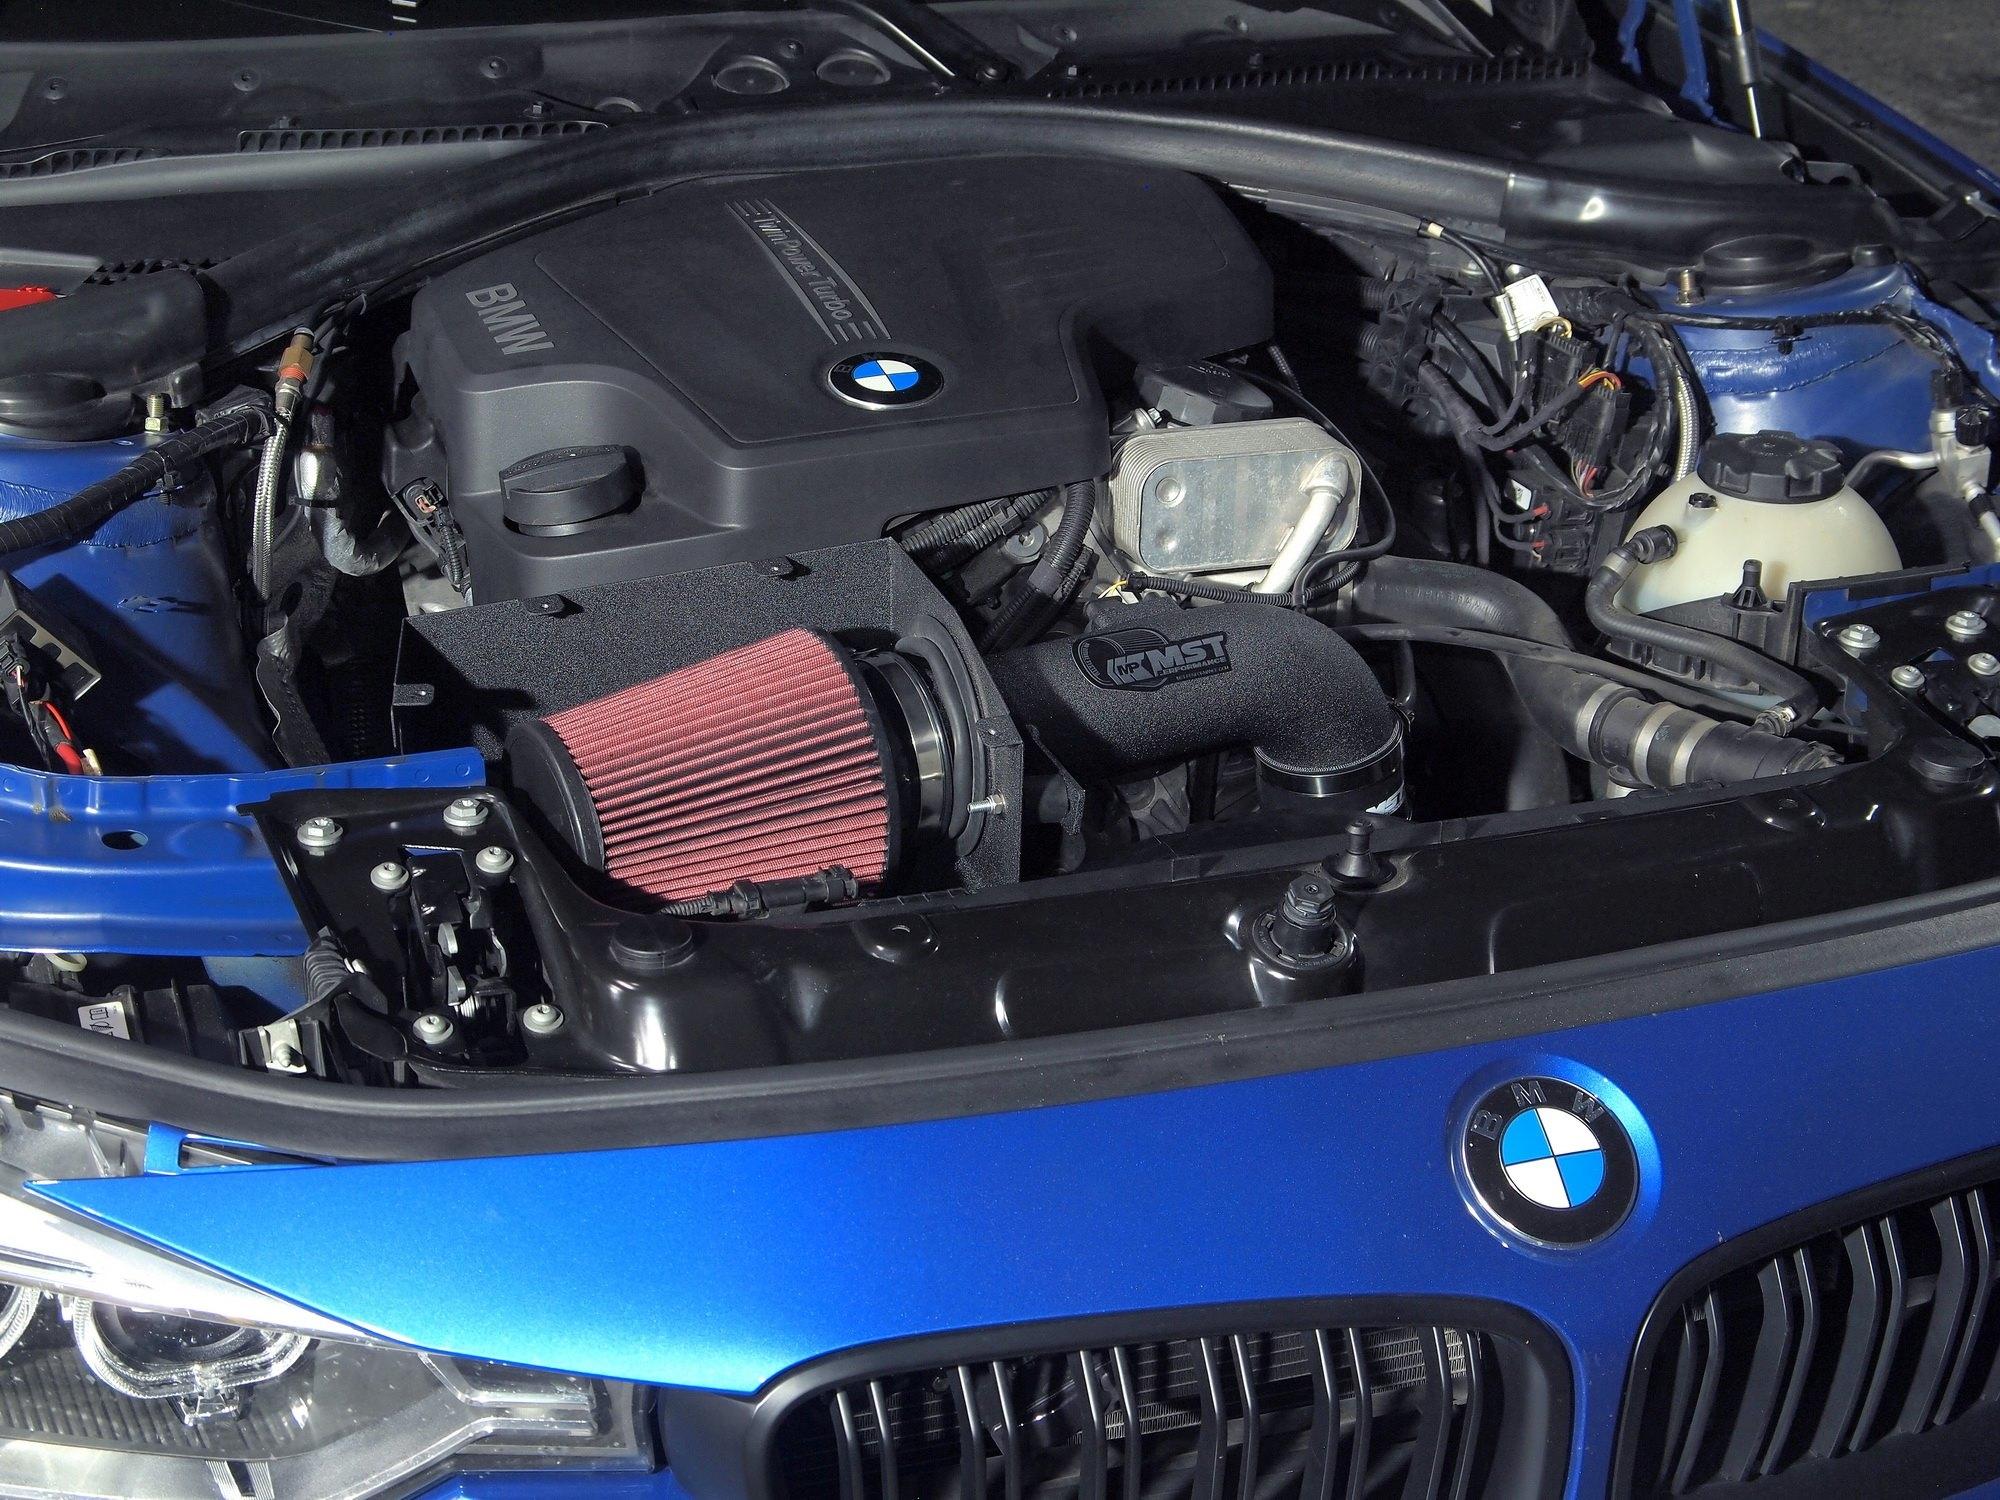 2015 N20 Engine